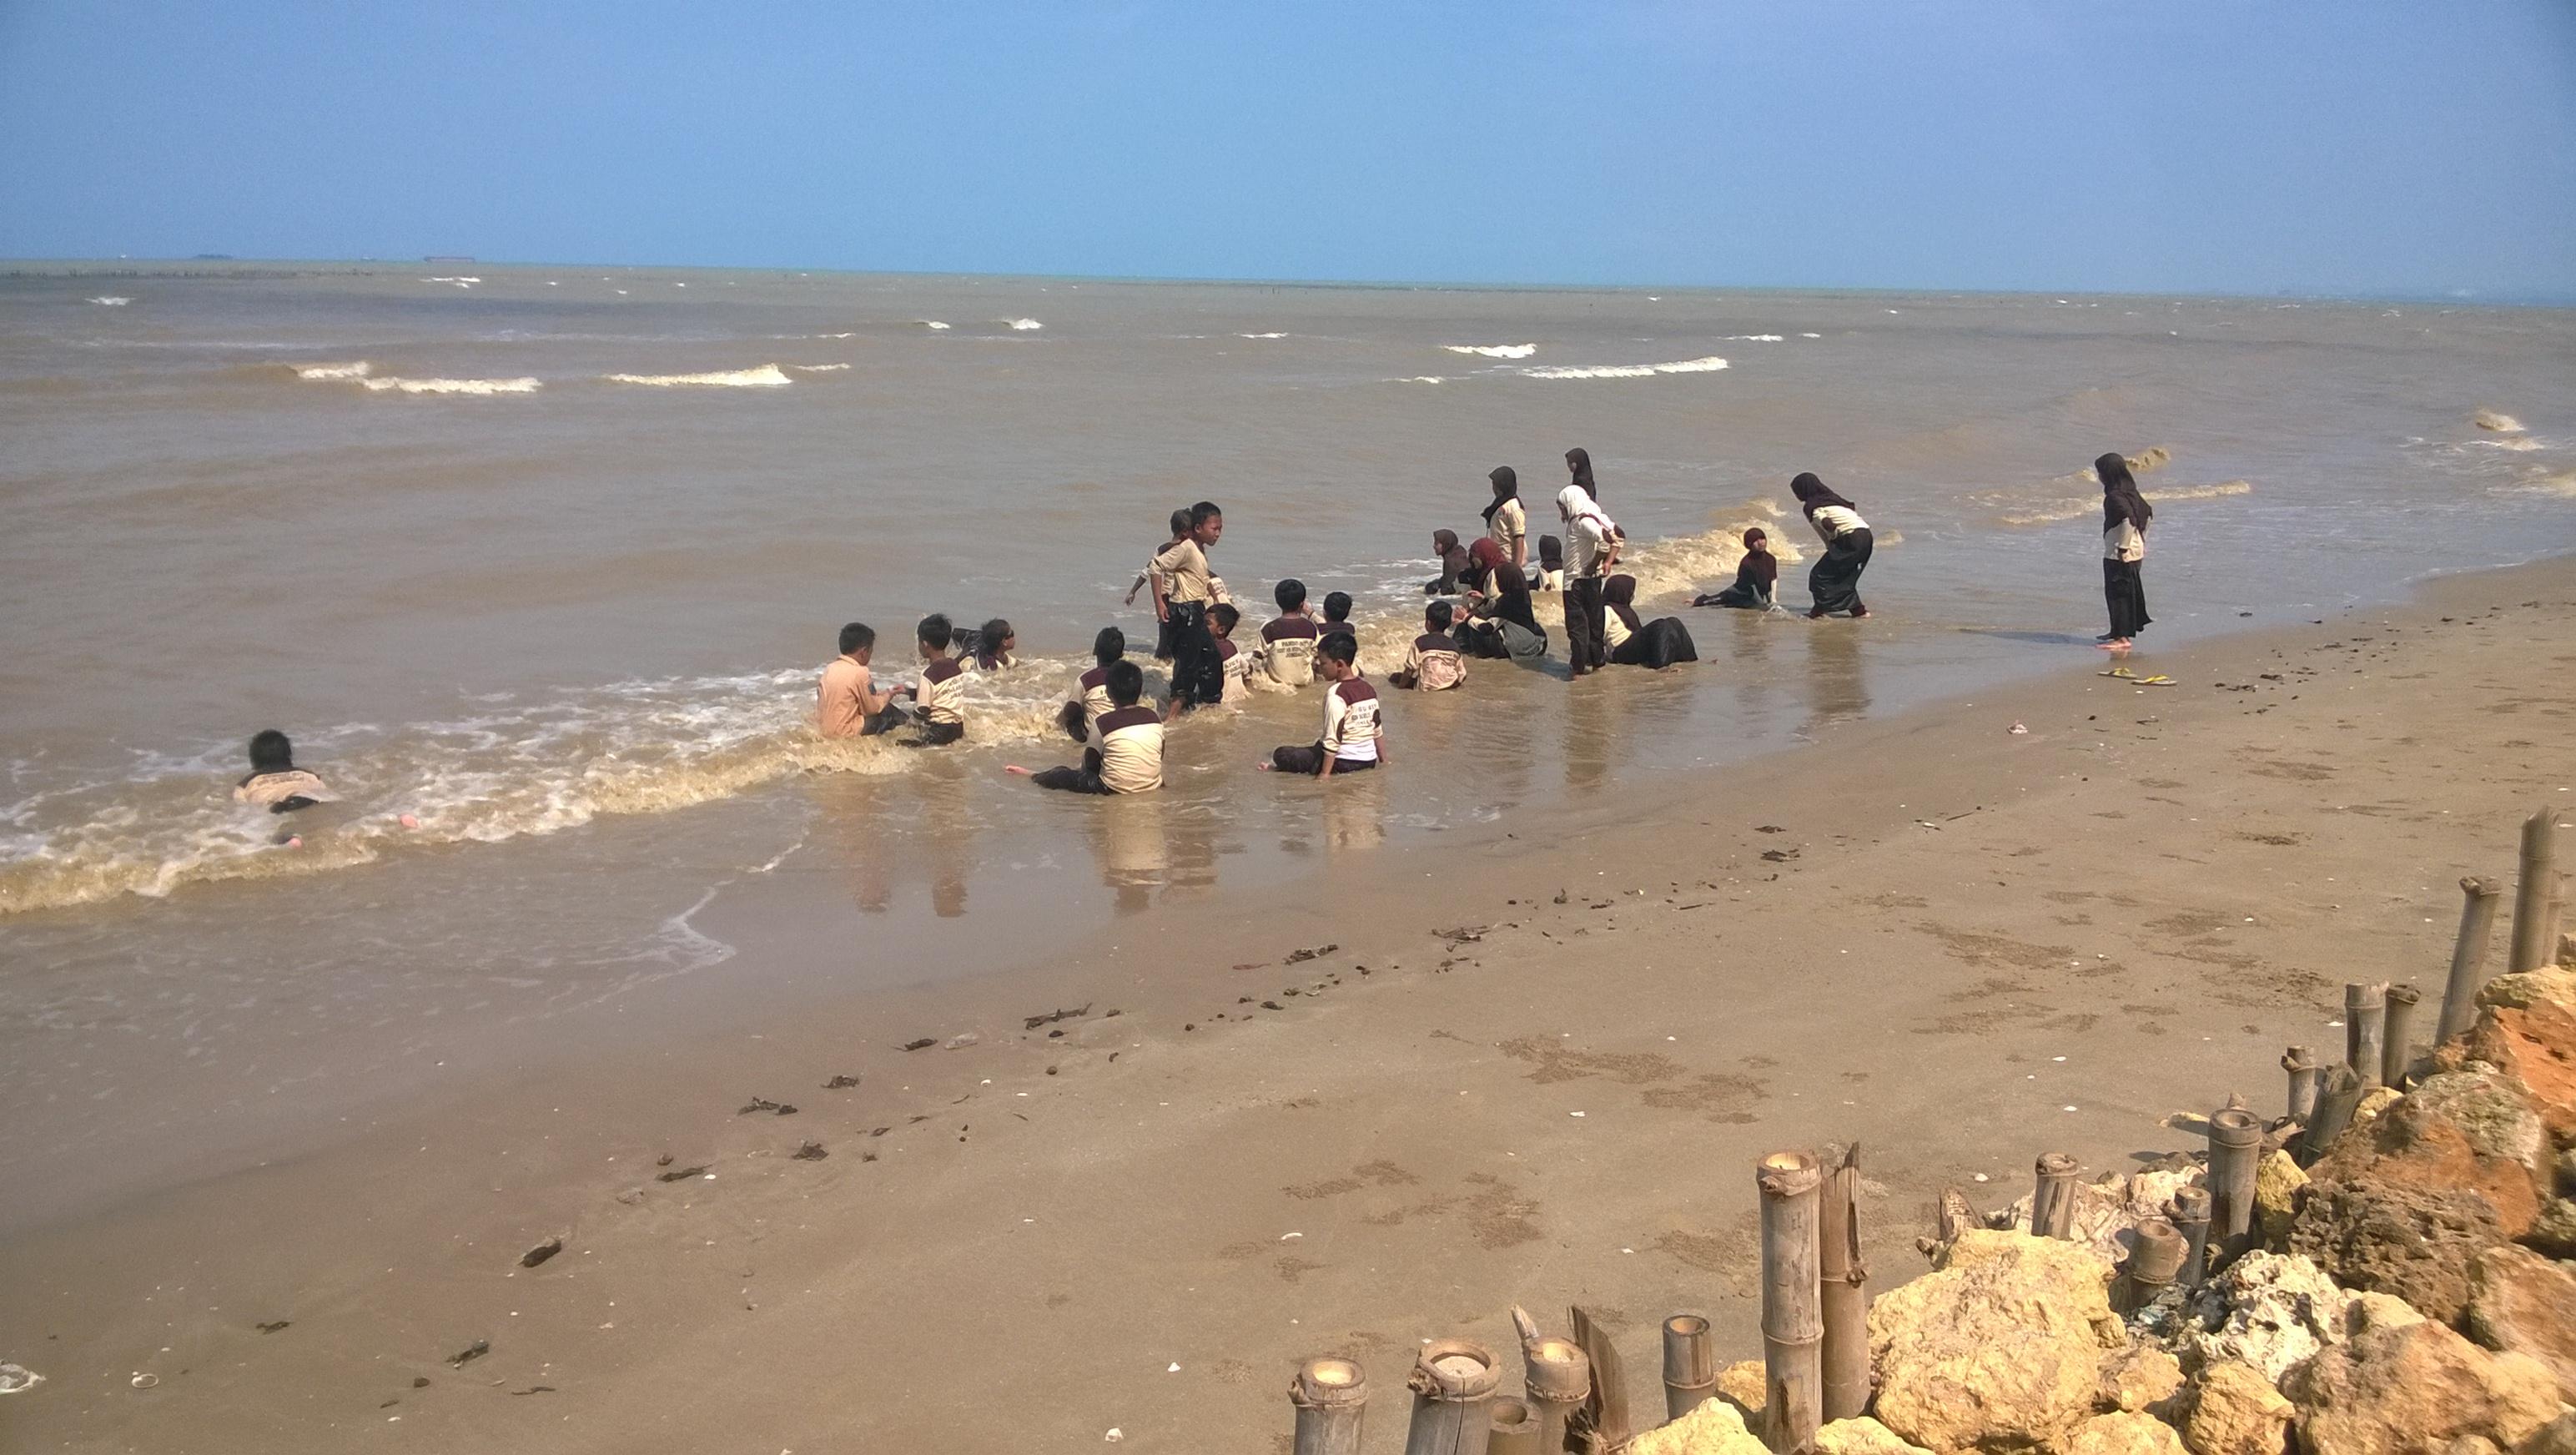 Mangrove Center Tuban Acara Dilanjutkan Tur Melihat Langsung Ekosistem Menjadi